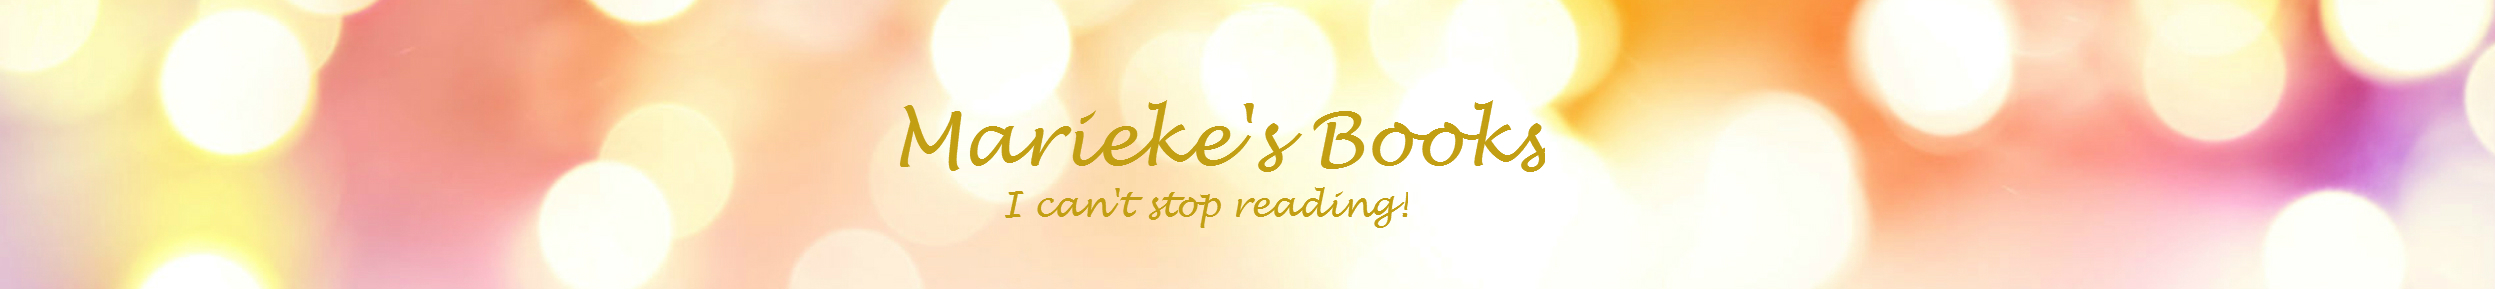 Marieke's Books